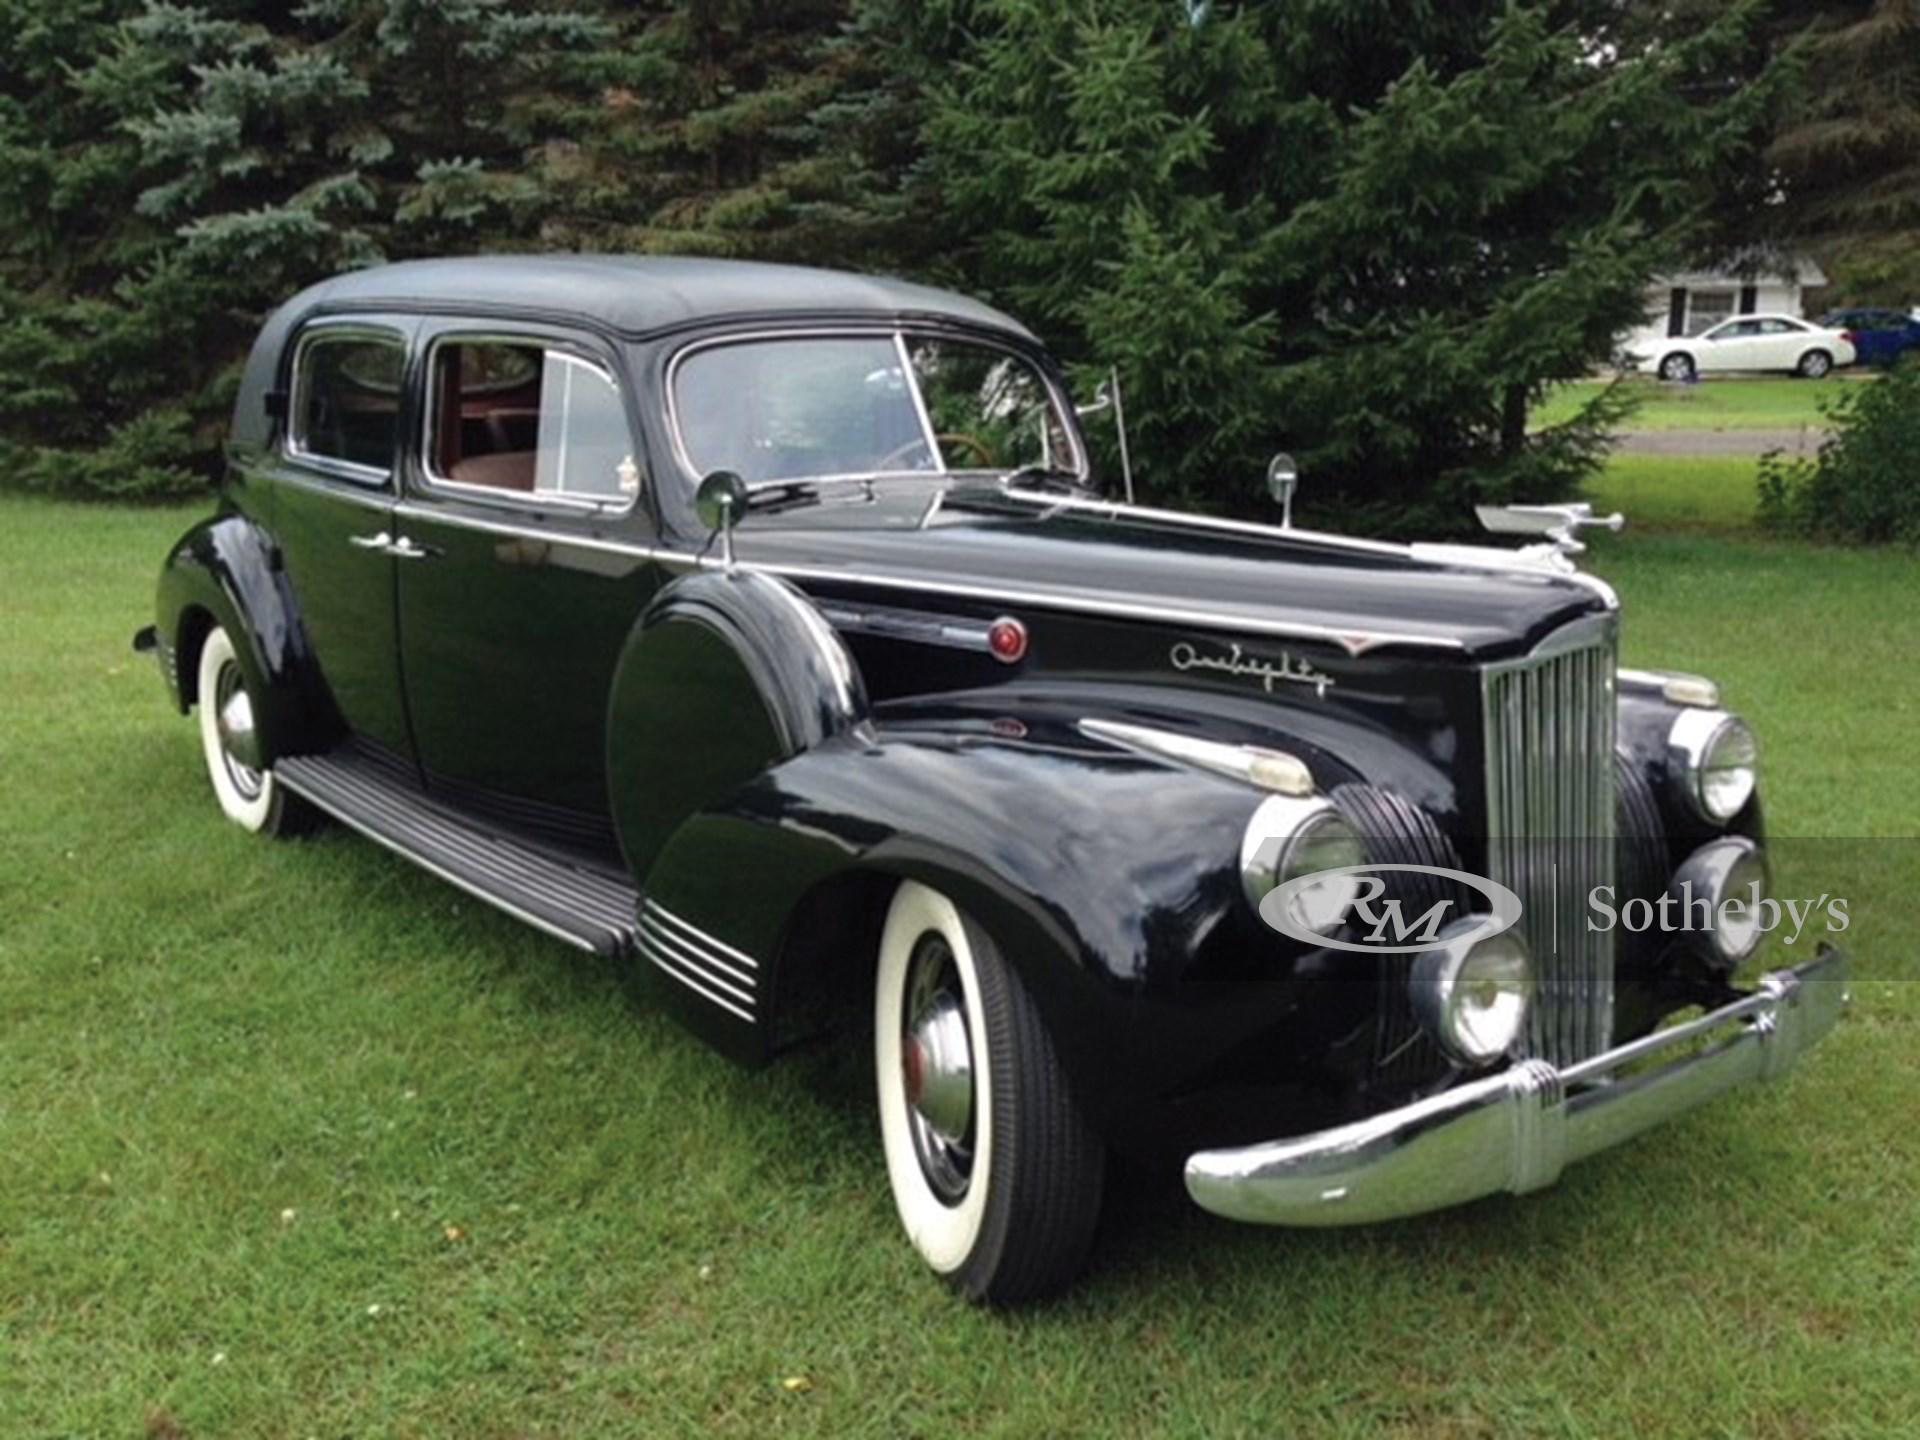 1941 Packard Super Eight One Eighty Sedan